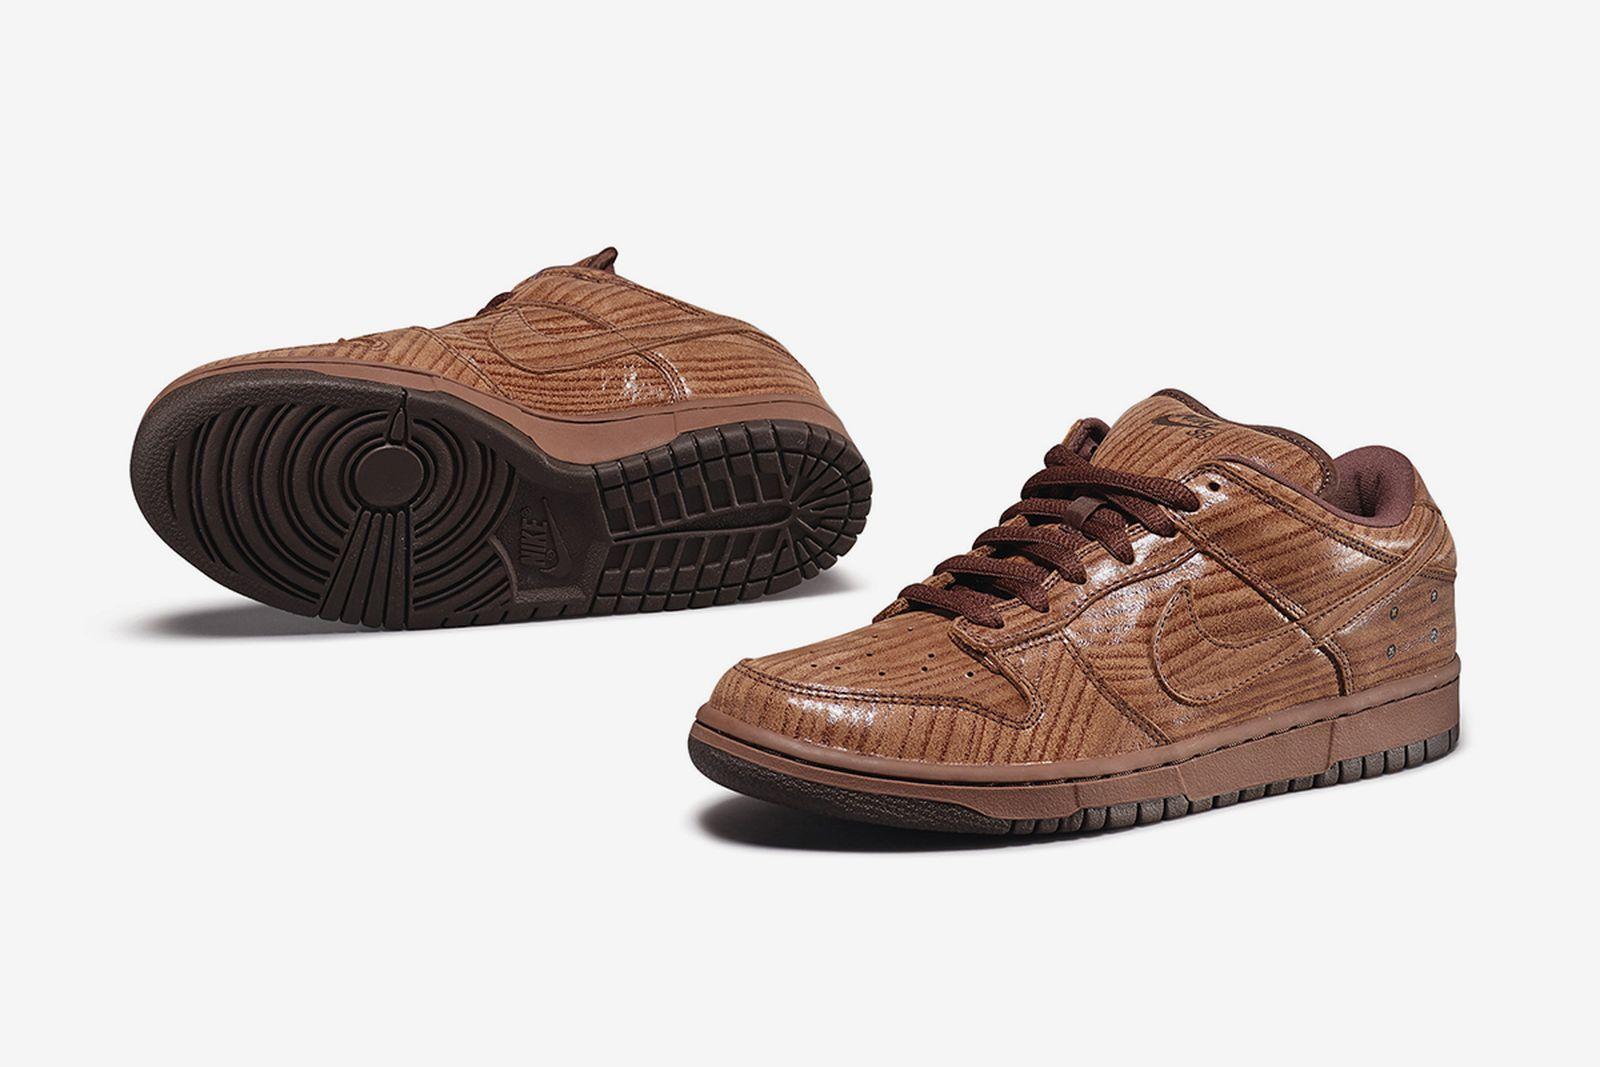 sothebys-nike-sneaker-auction-06